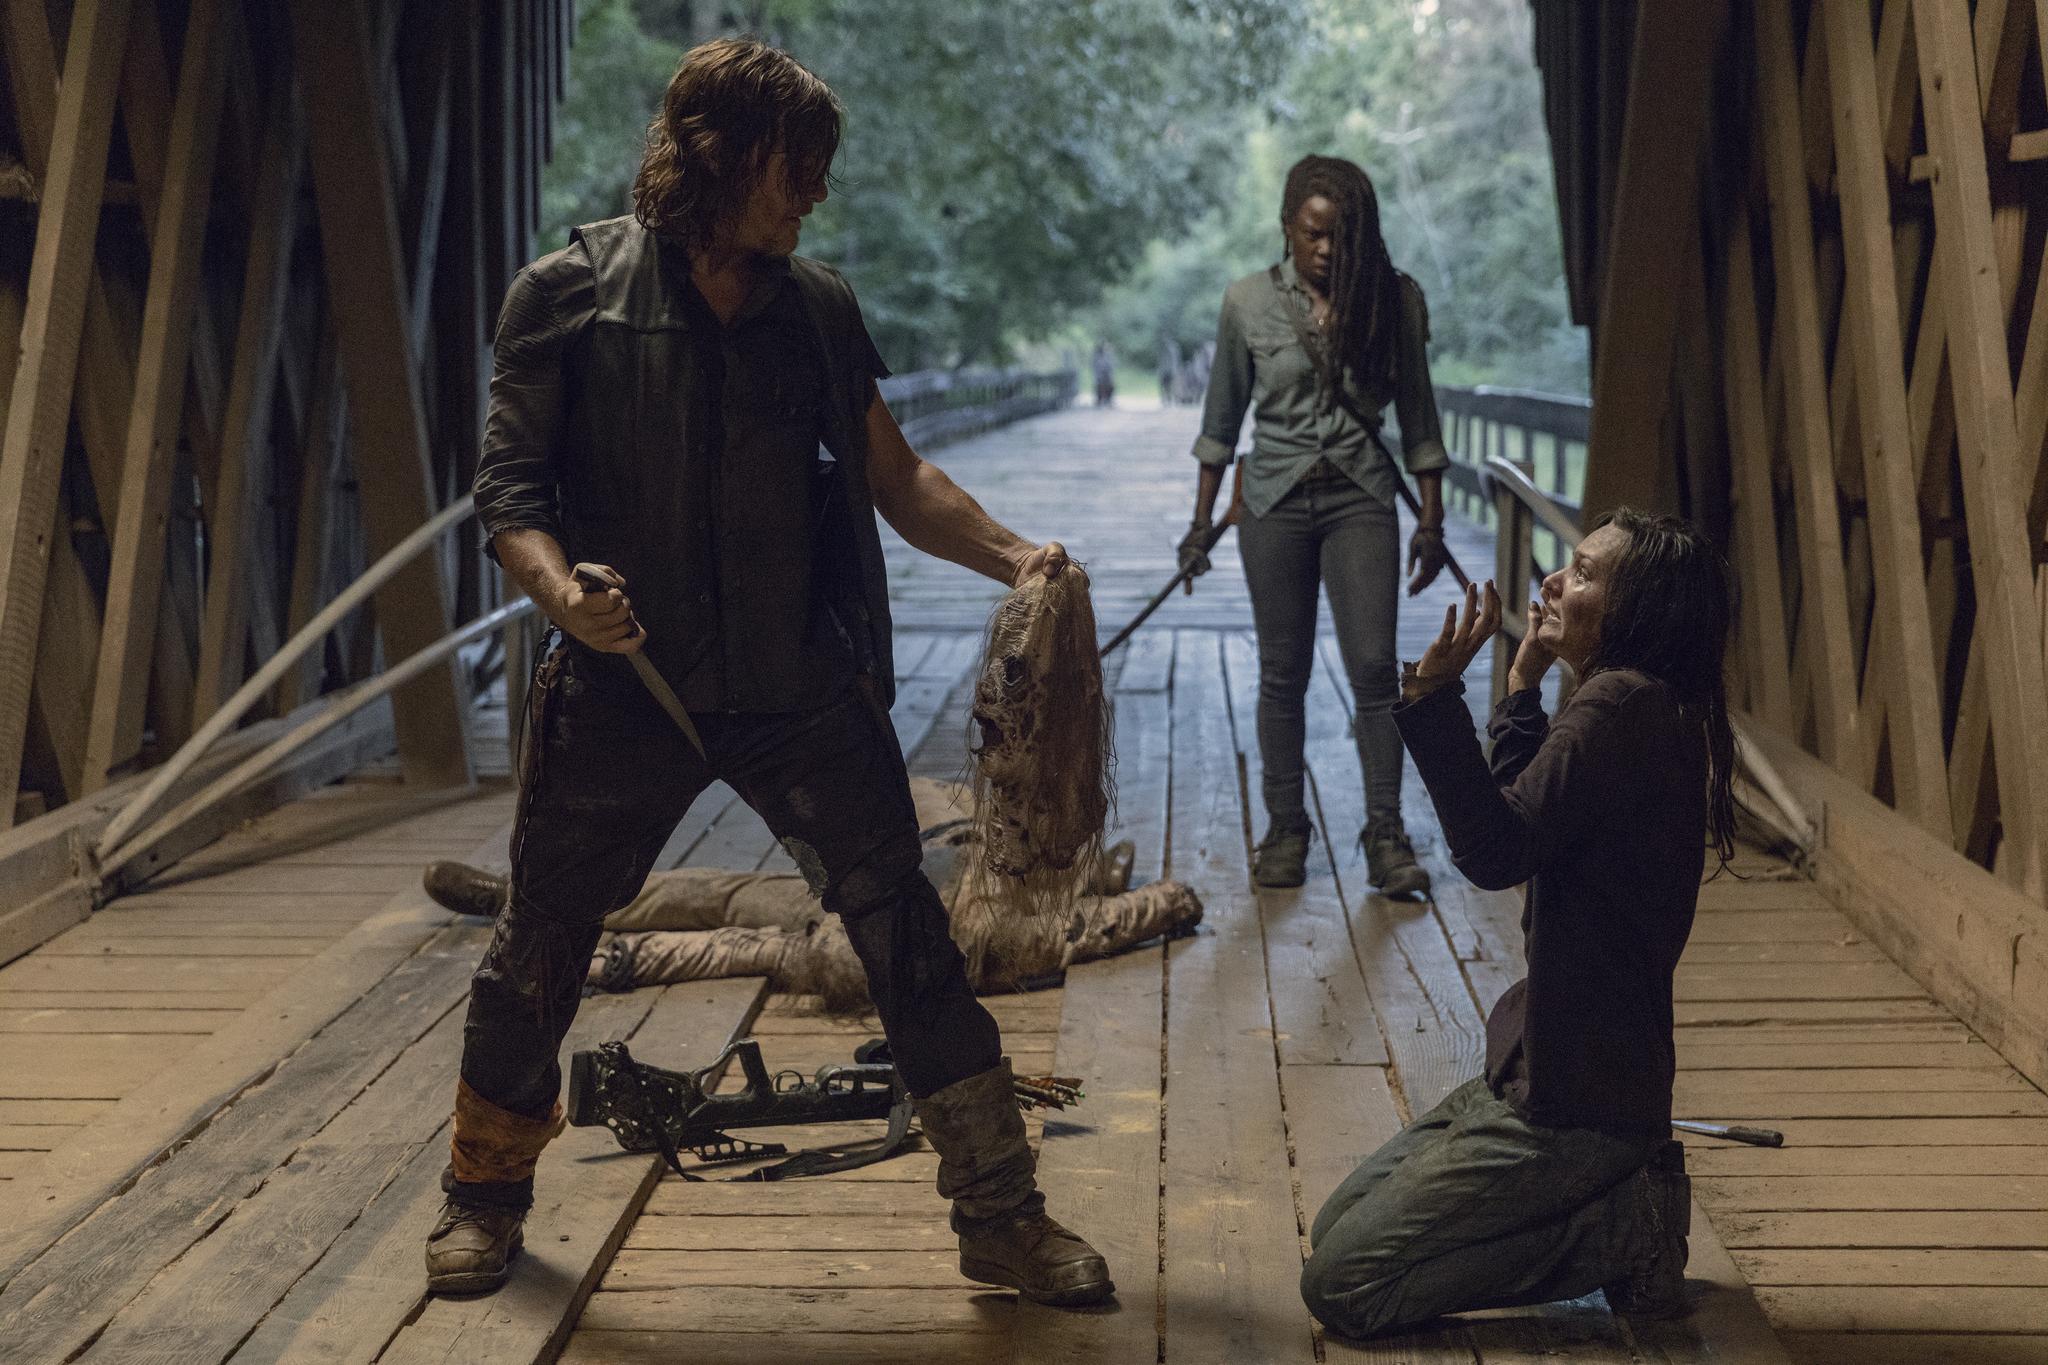 Norman Reedus, Danai Gurira, David L. Marston, and Cassady McClincy in The Walking Dead (2010)